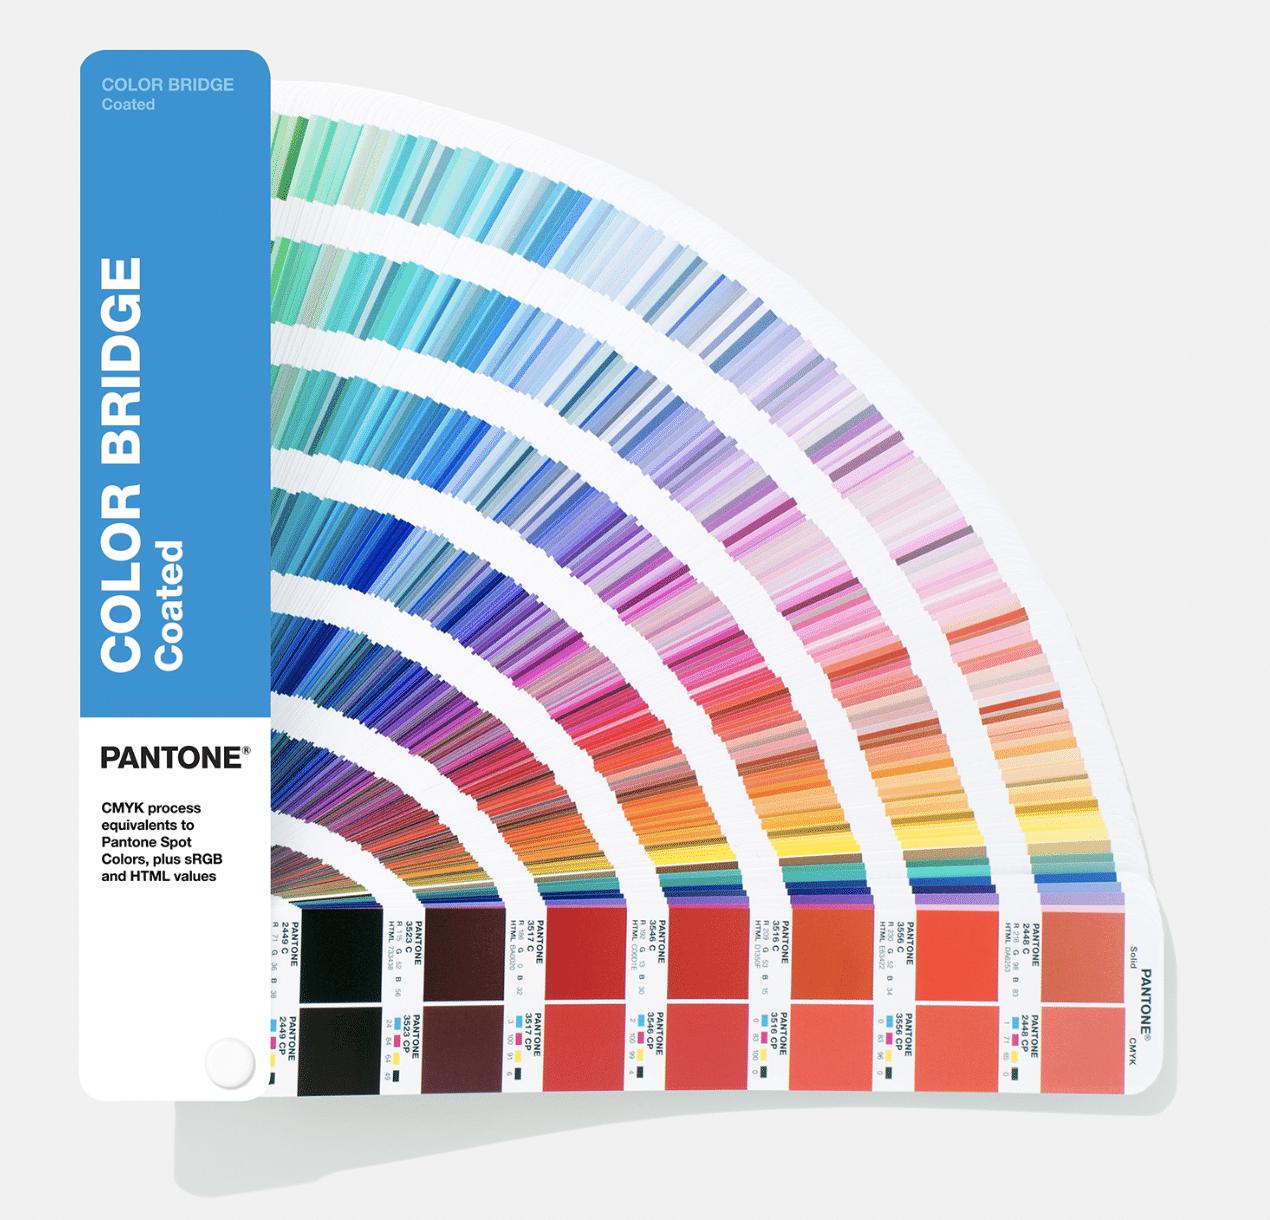 Pantone Color Bridge Coated Version 2020 Pantone Latinoamerica